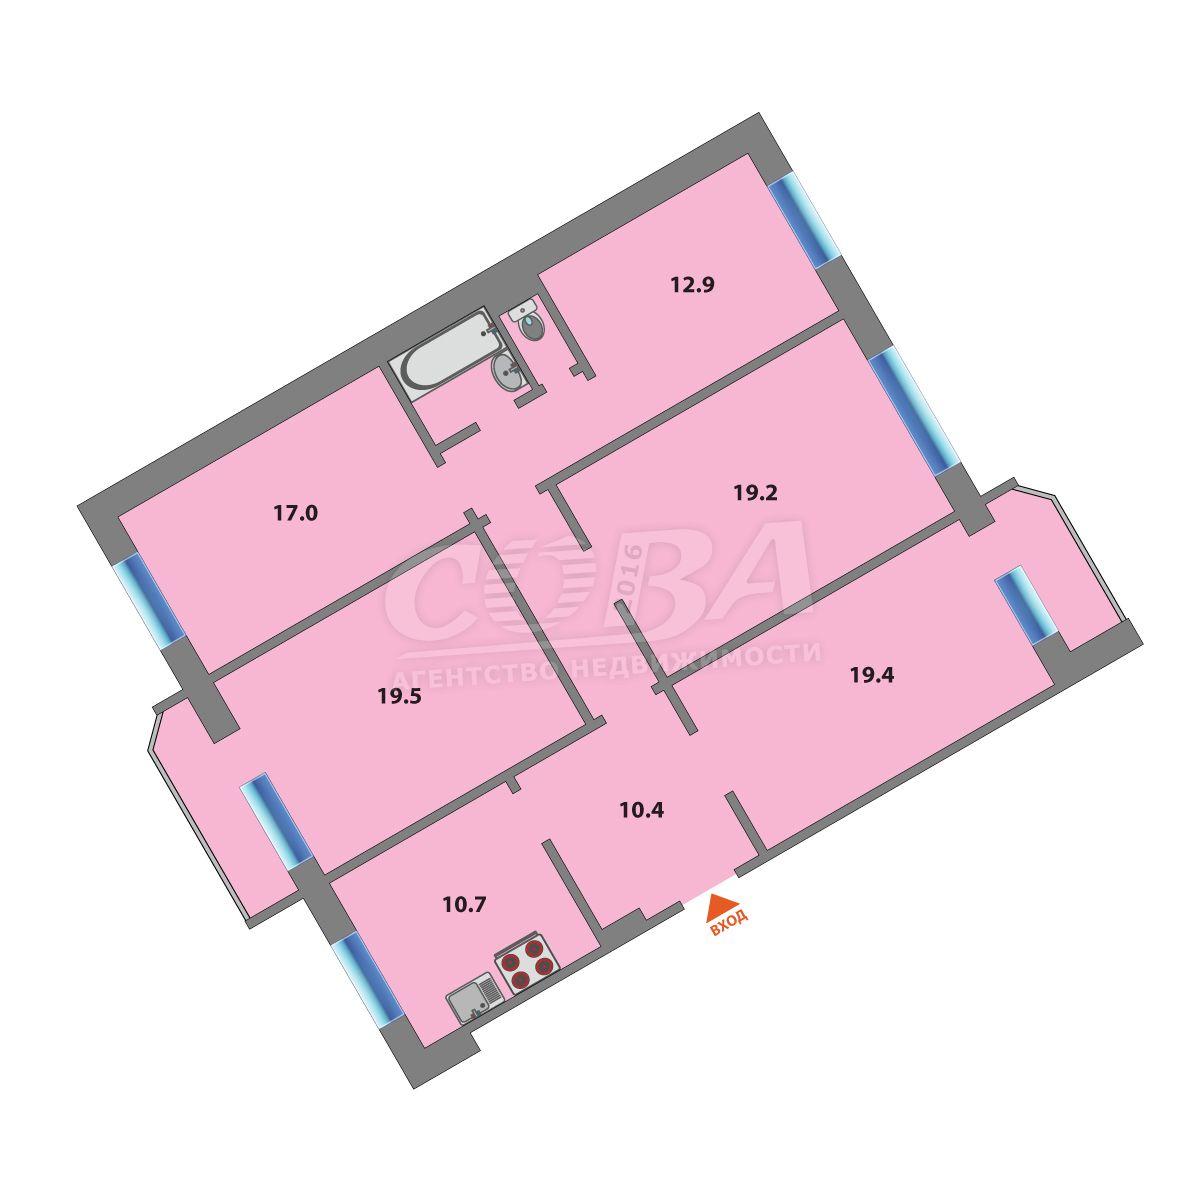 Многокомнатн. квартира  в районе Московского тр., ул. Московский тракт, 163, г. Тюмень